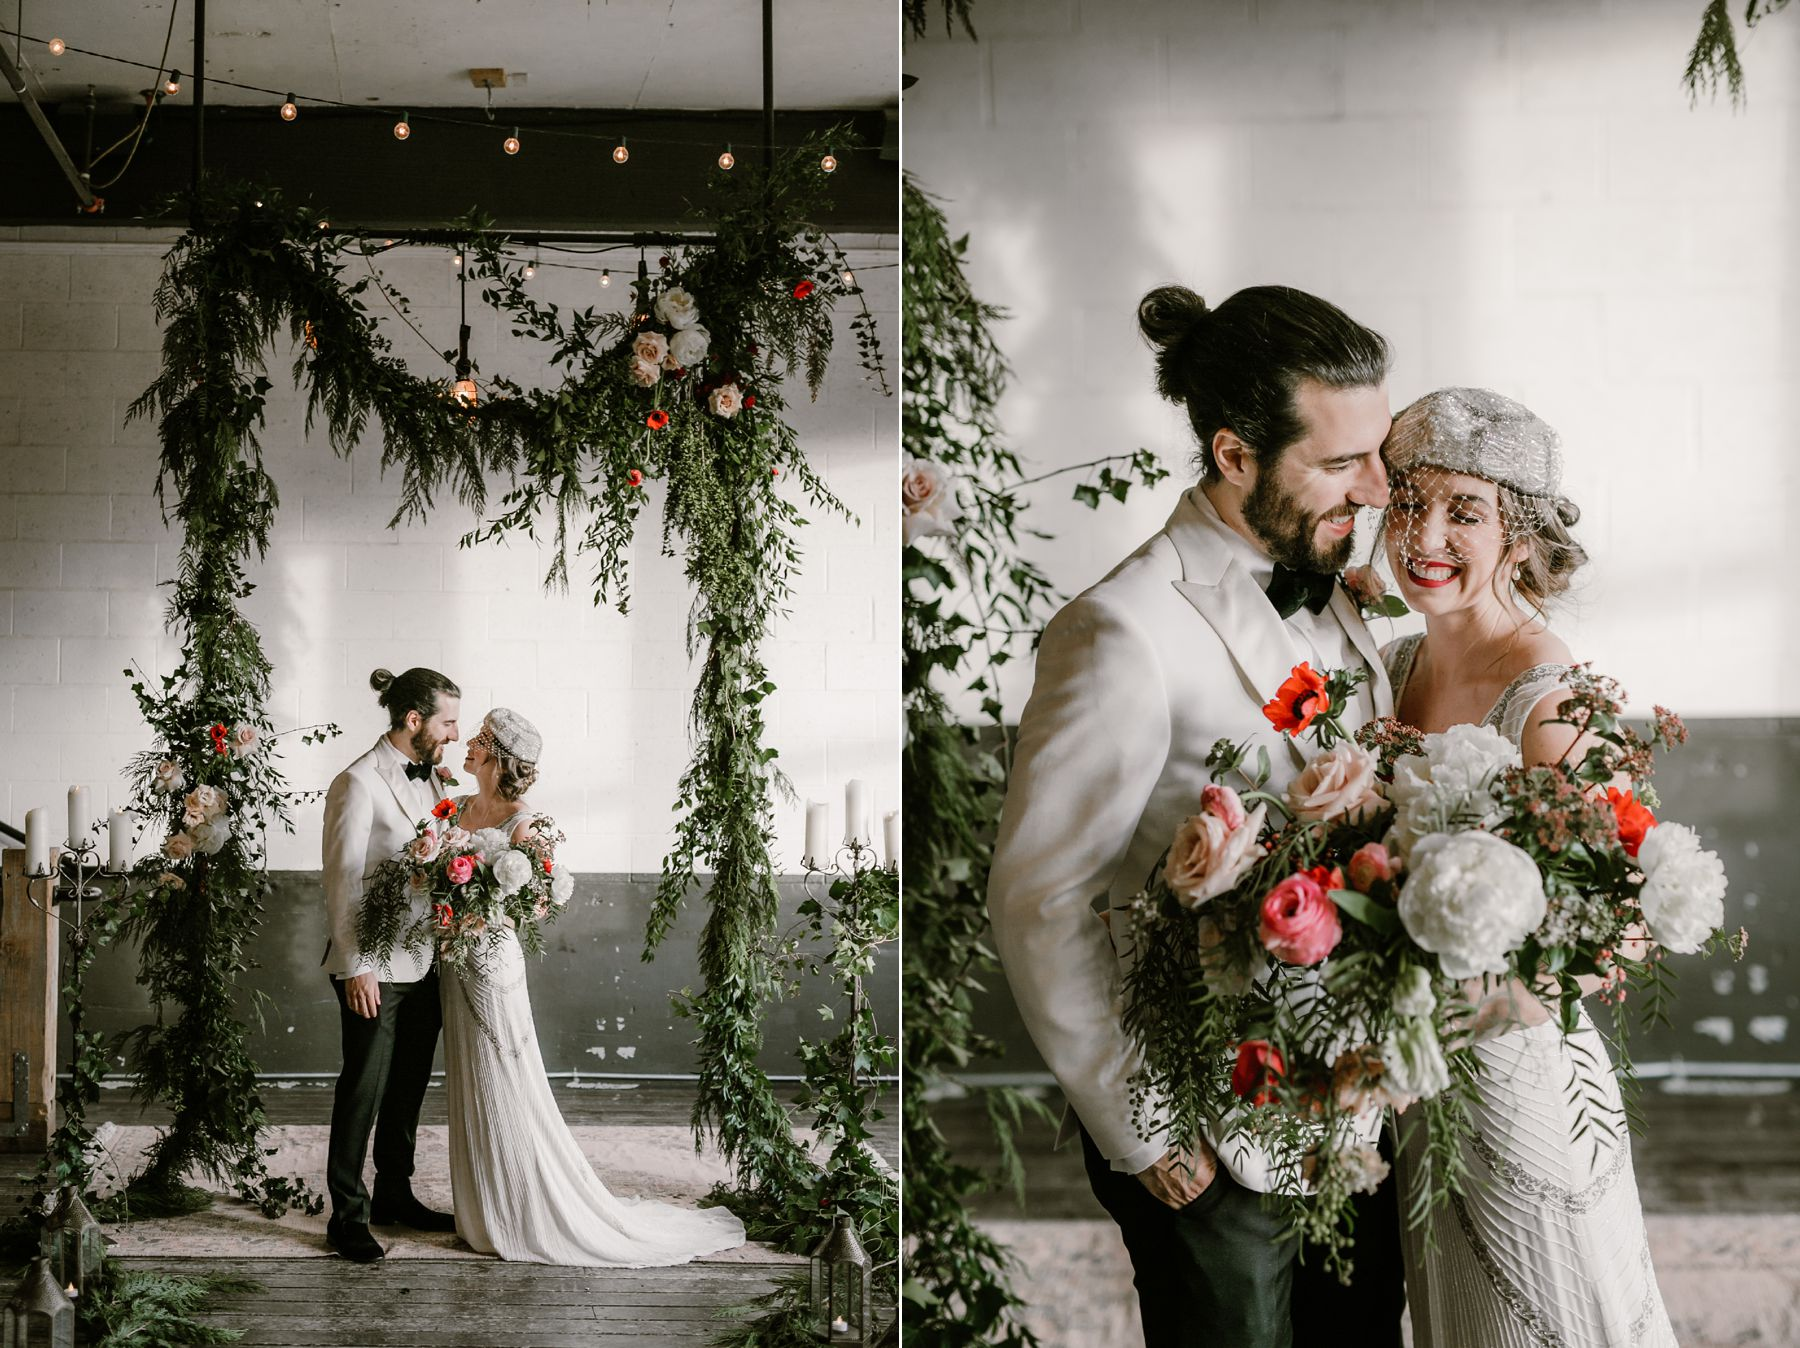 Ceremony decor at a Union/Pine wedding